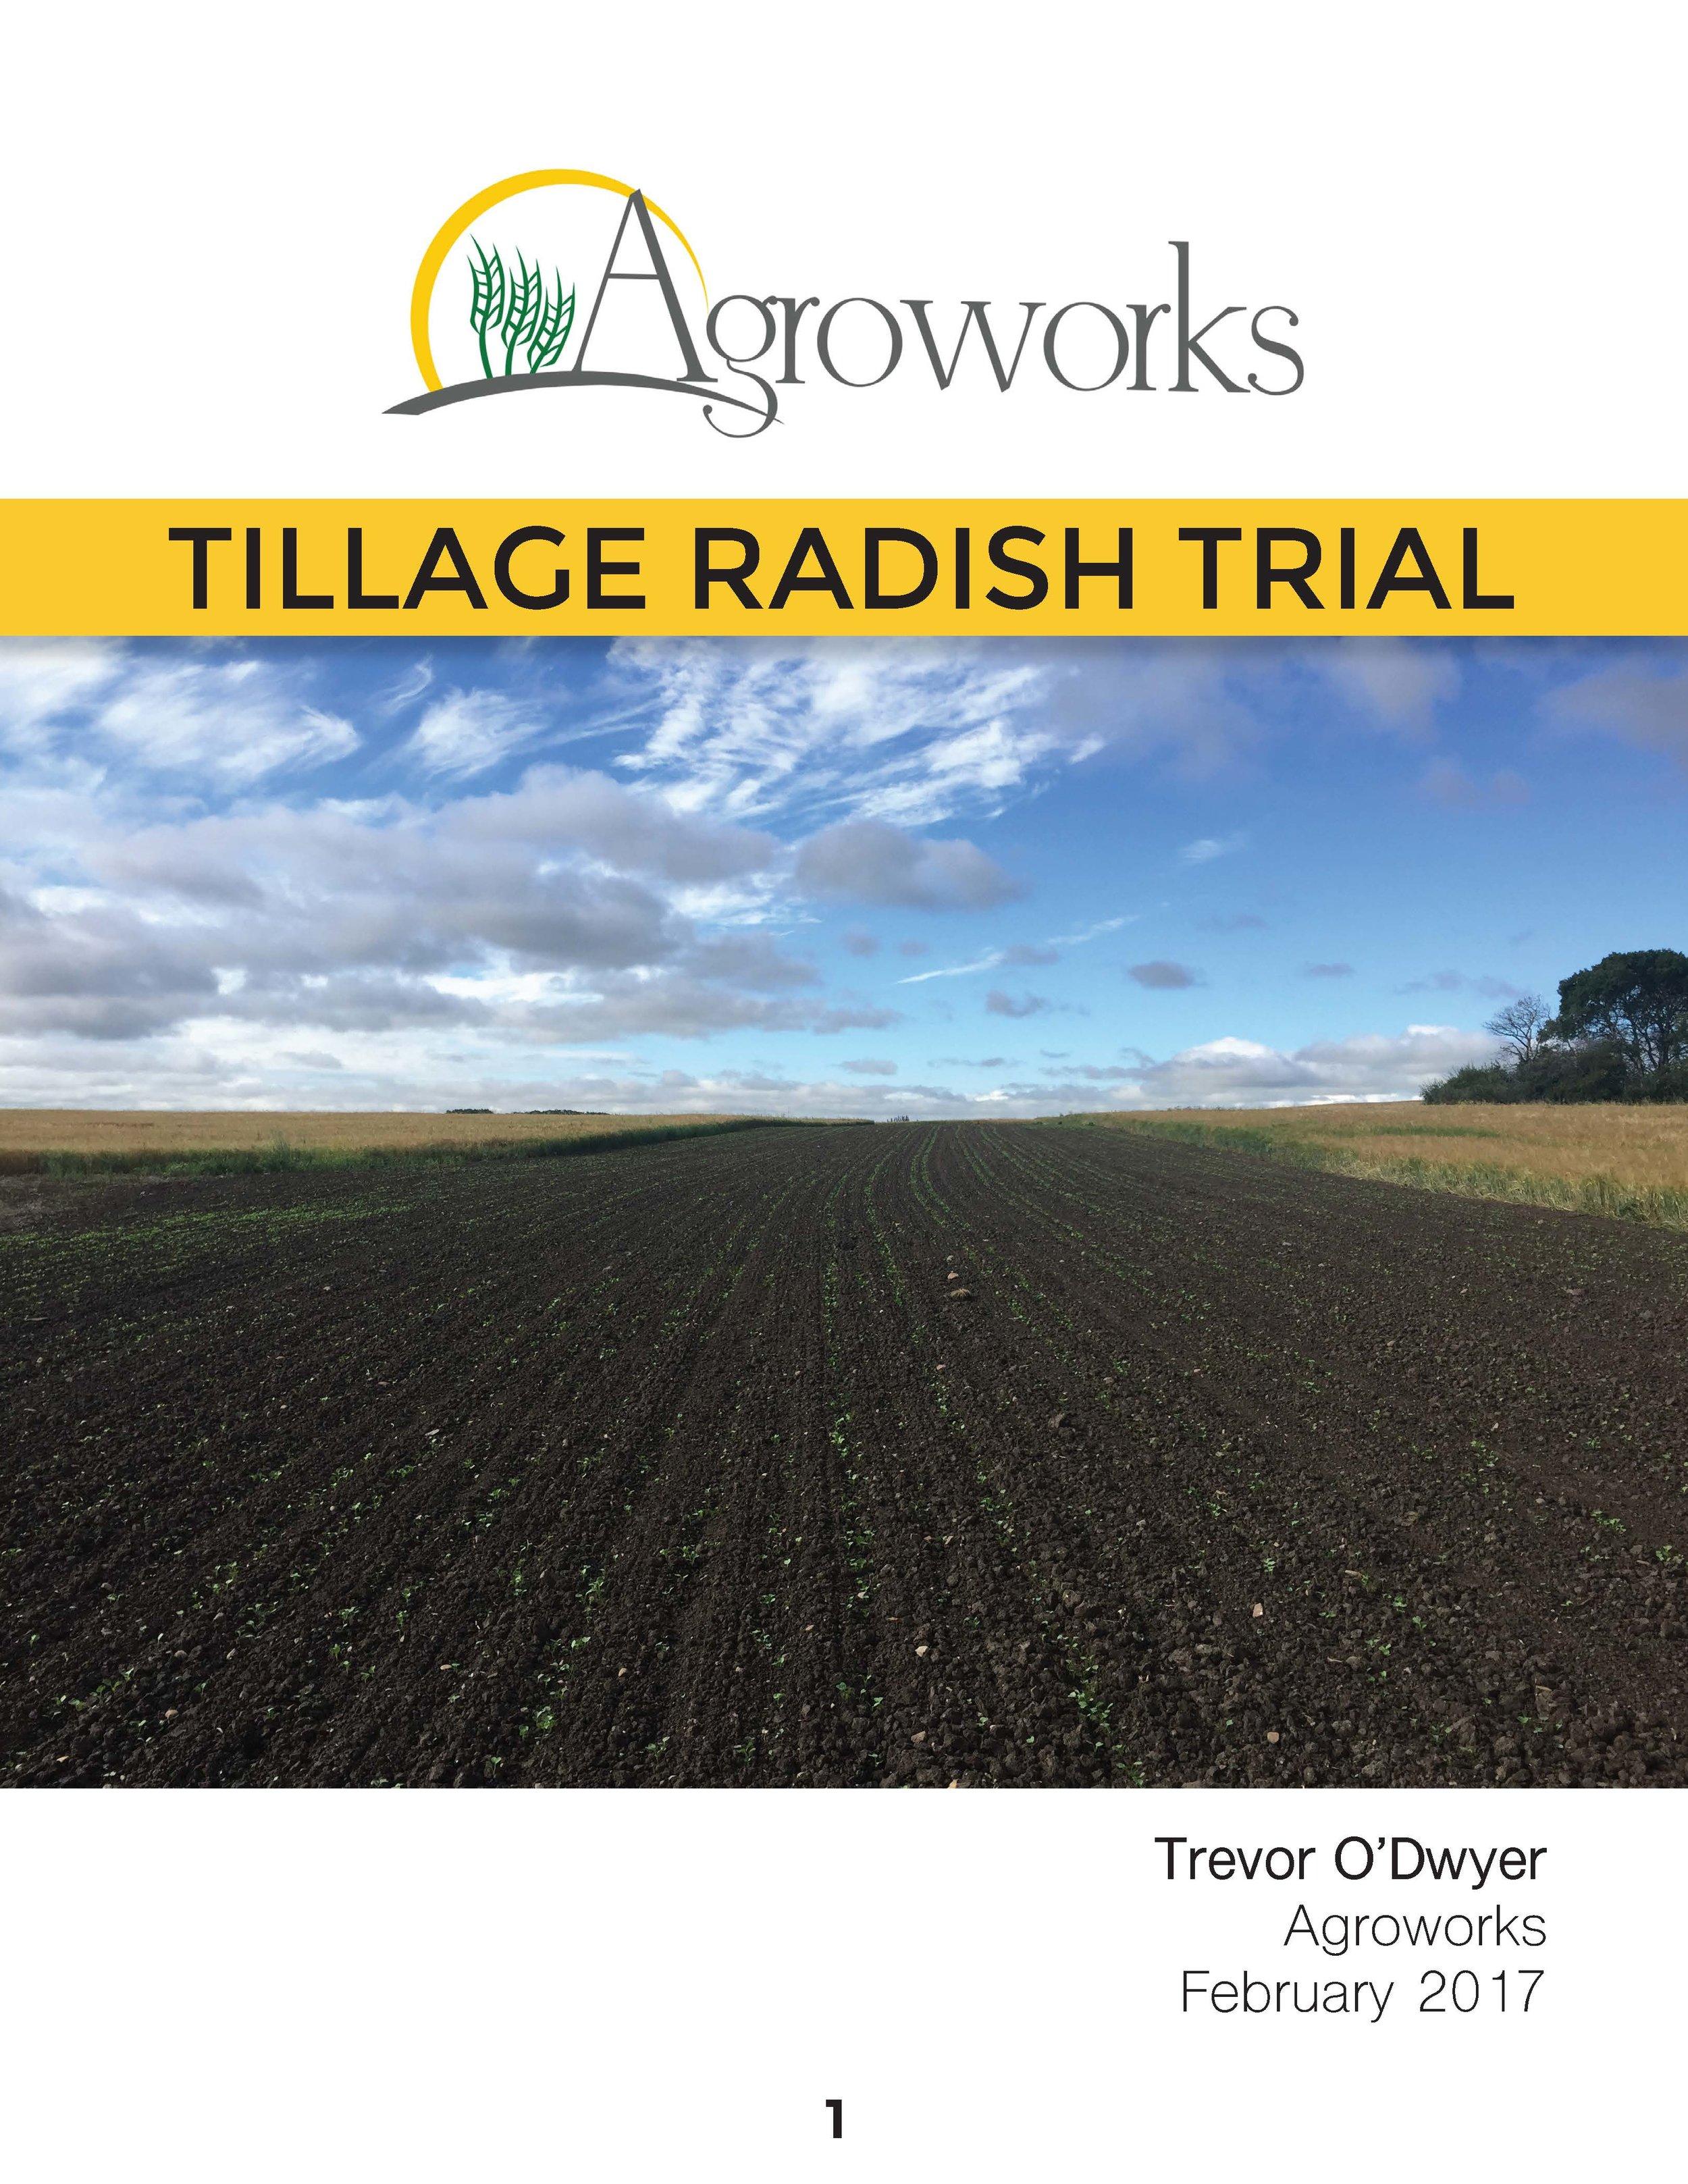 TILLAGE_RADISH_TRIAL_Redesign (1)_Page_1.jpg